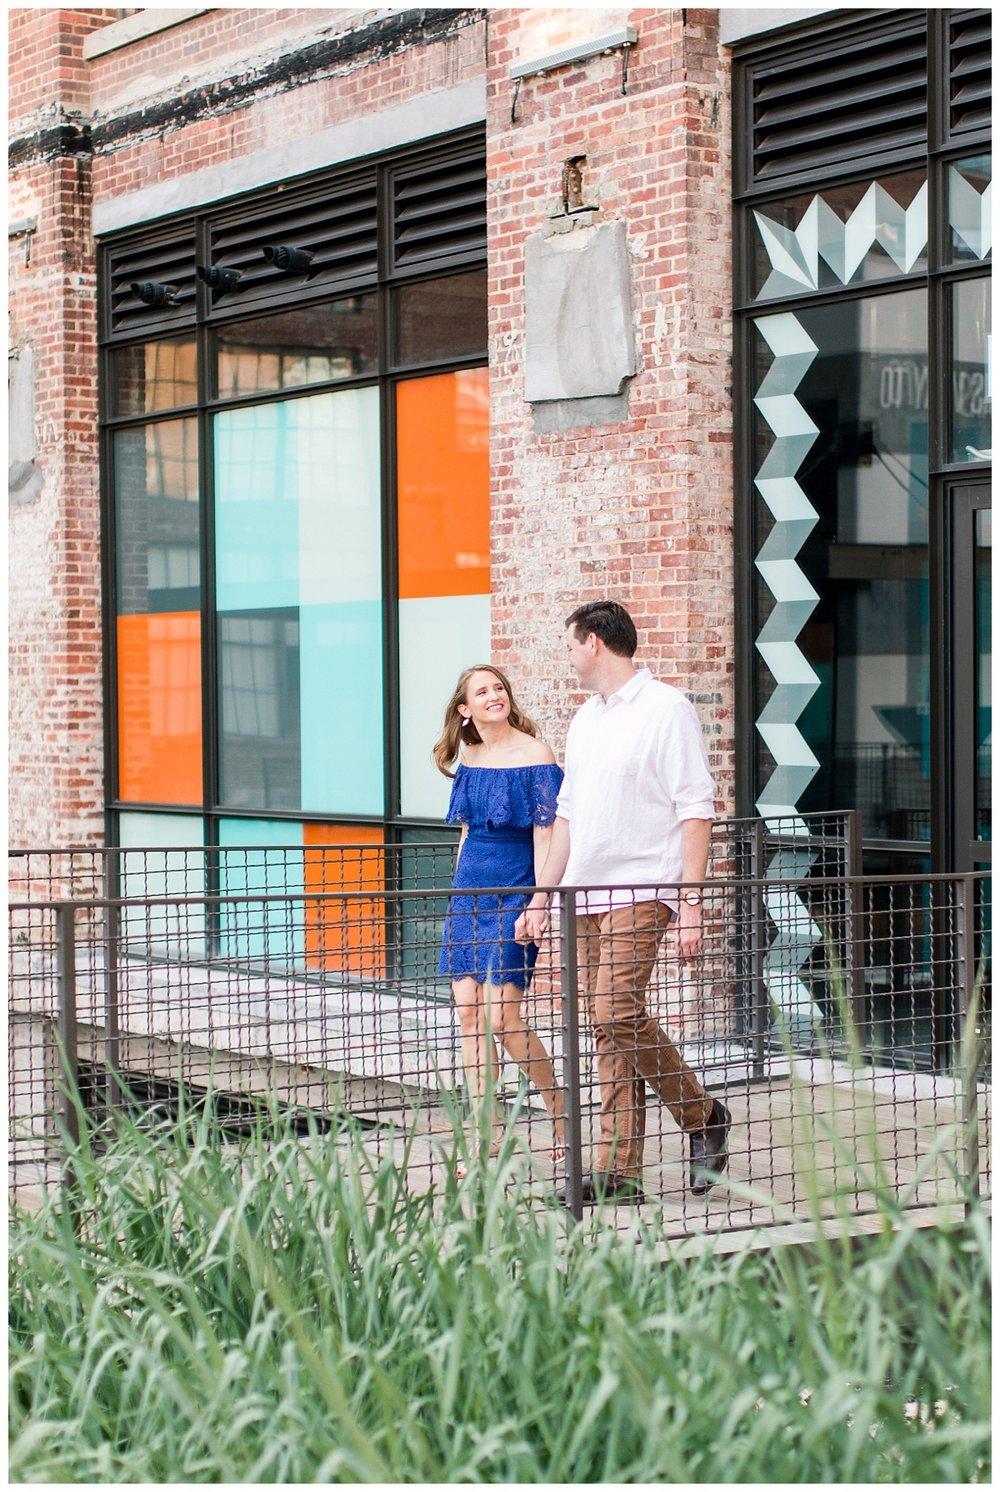 Engagement Pictures_KIm and Hamish_Abby Breaux Photography_Atlanta_Ponce City Market_Jackson Street Bridge_0041.jpg